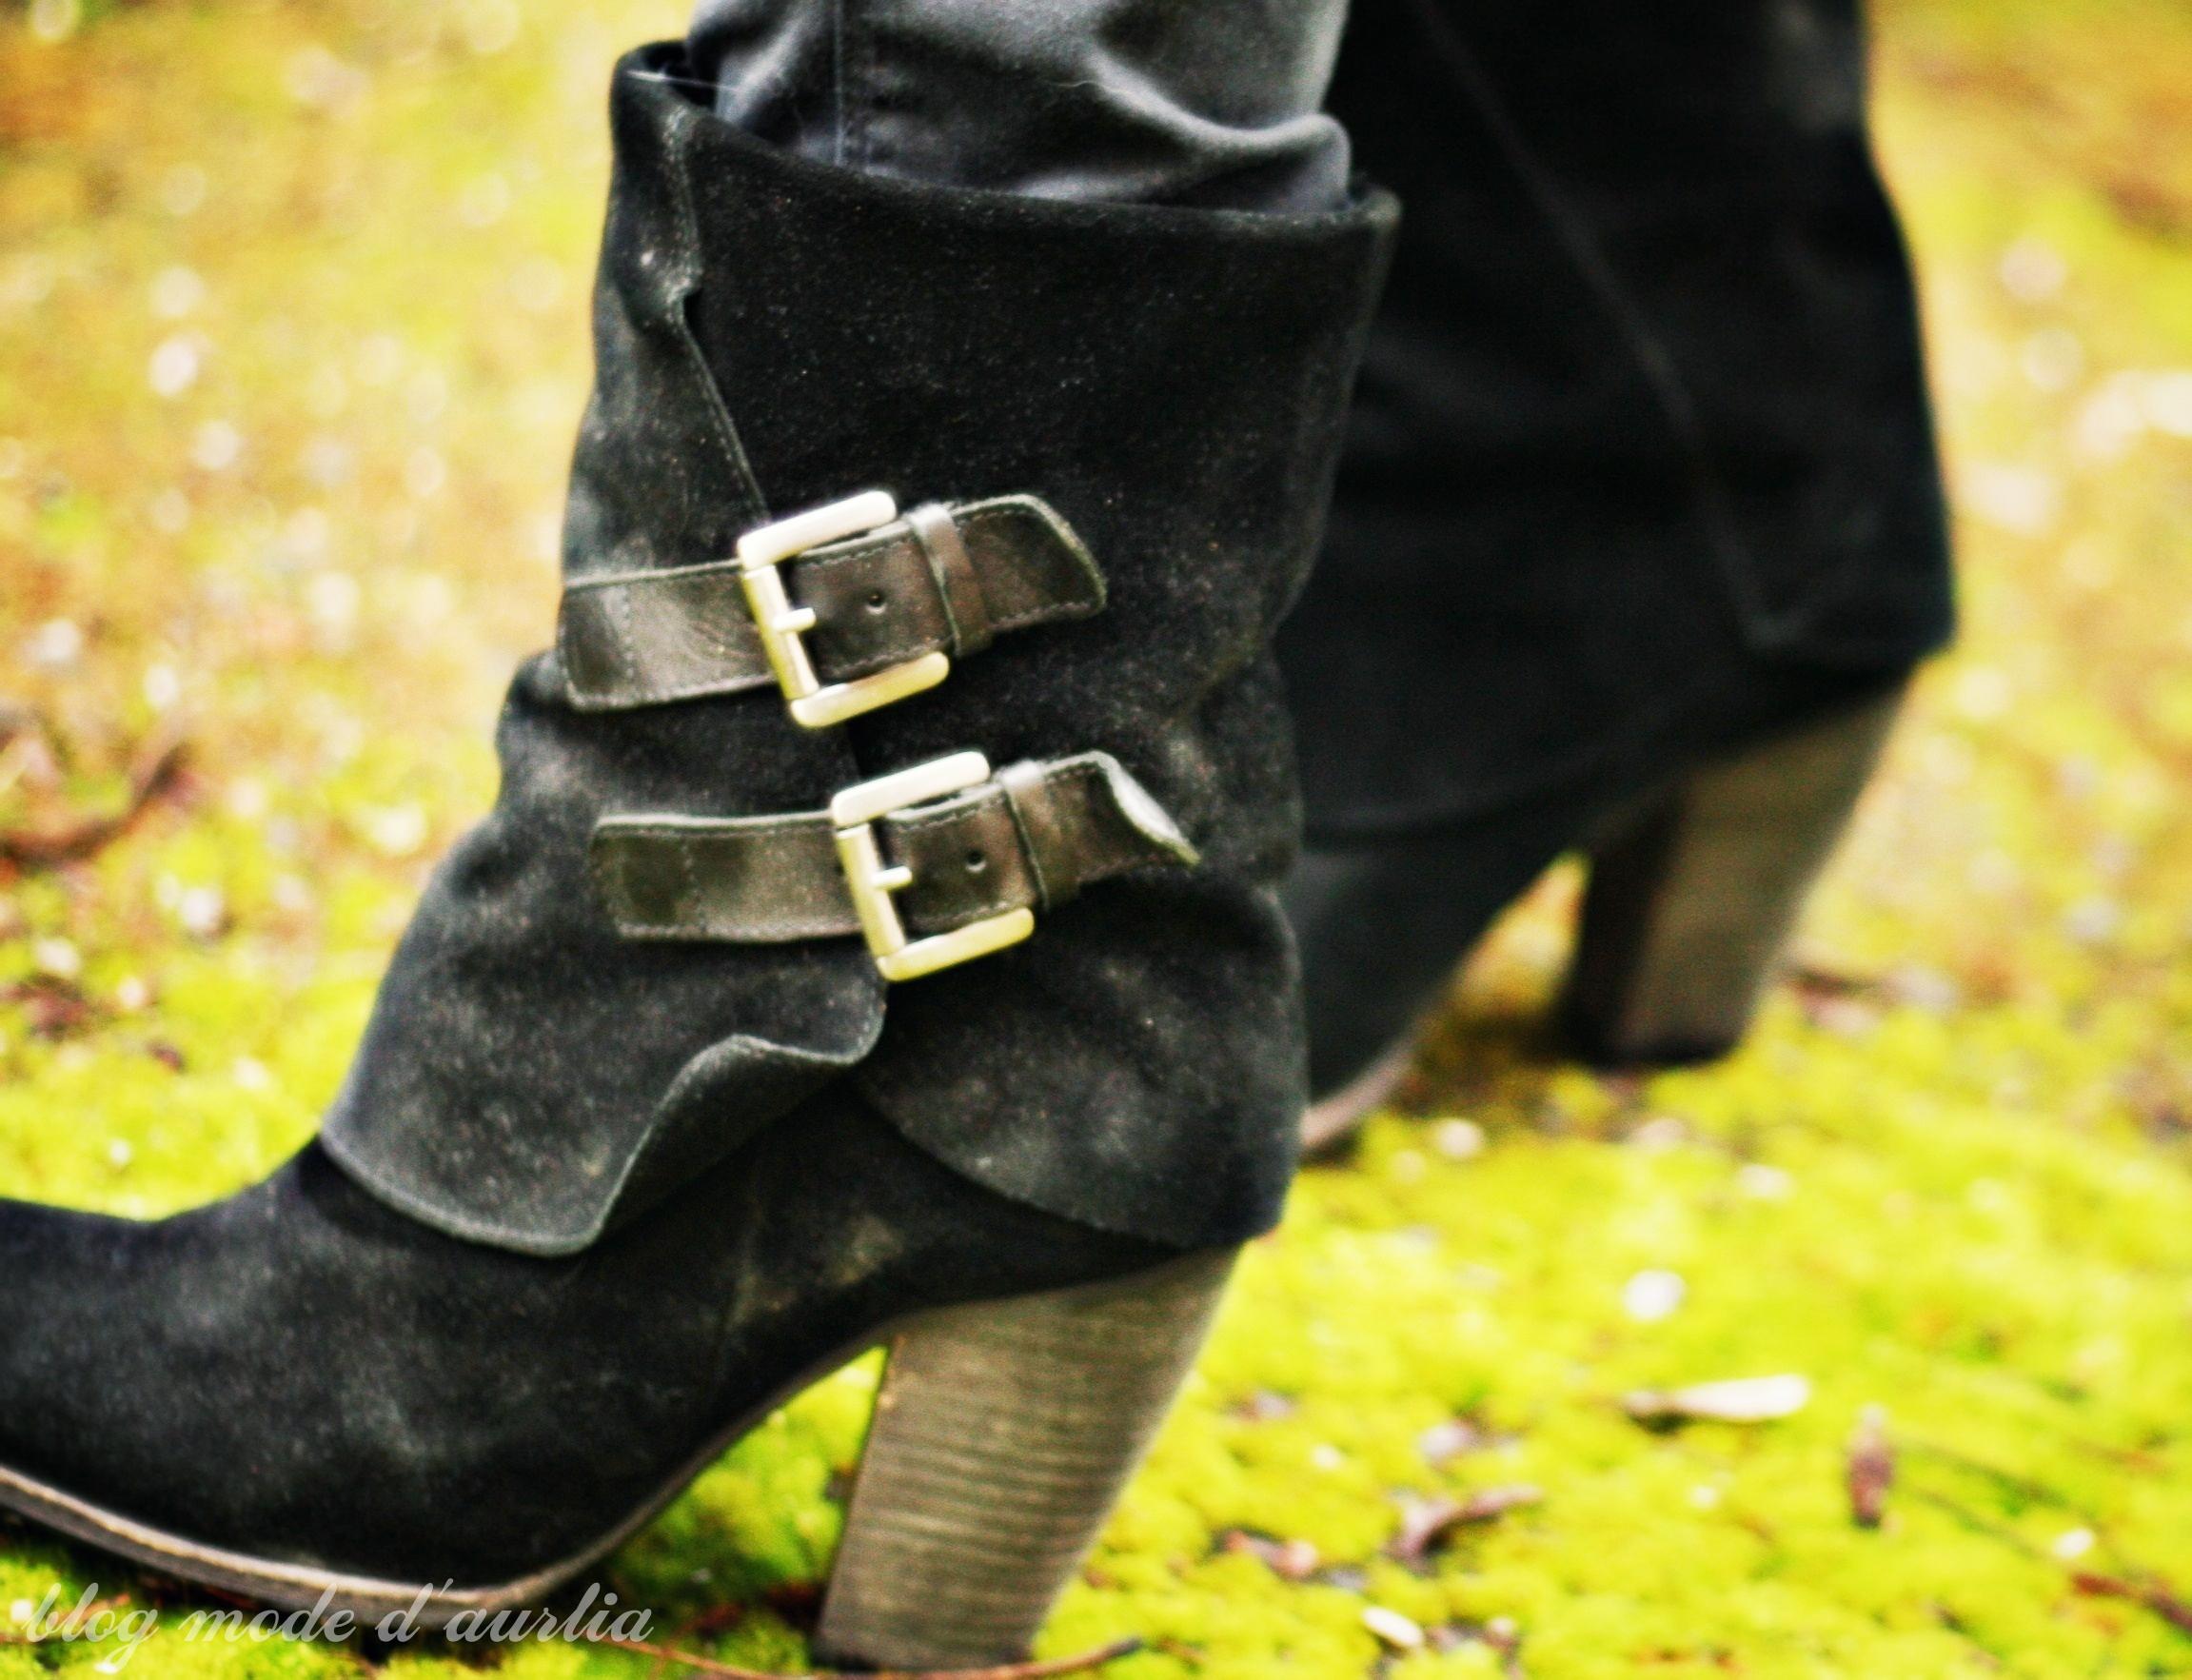 sanmarina boots